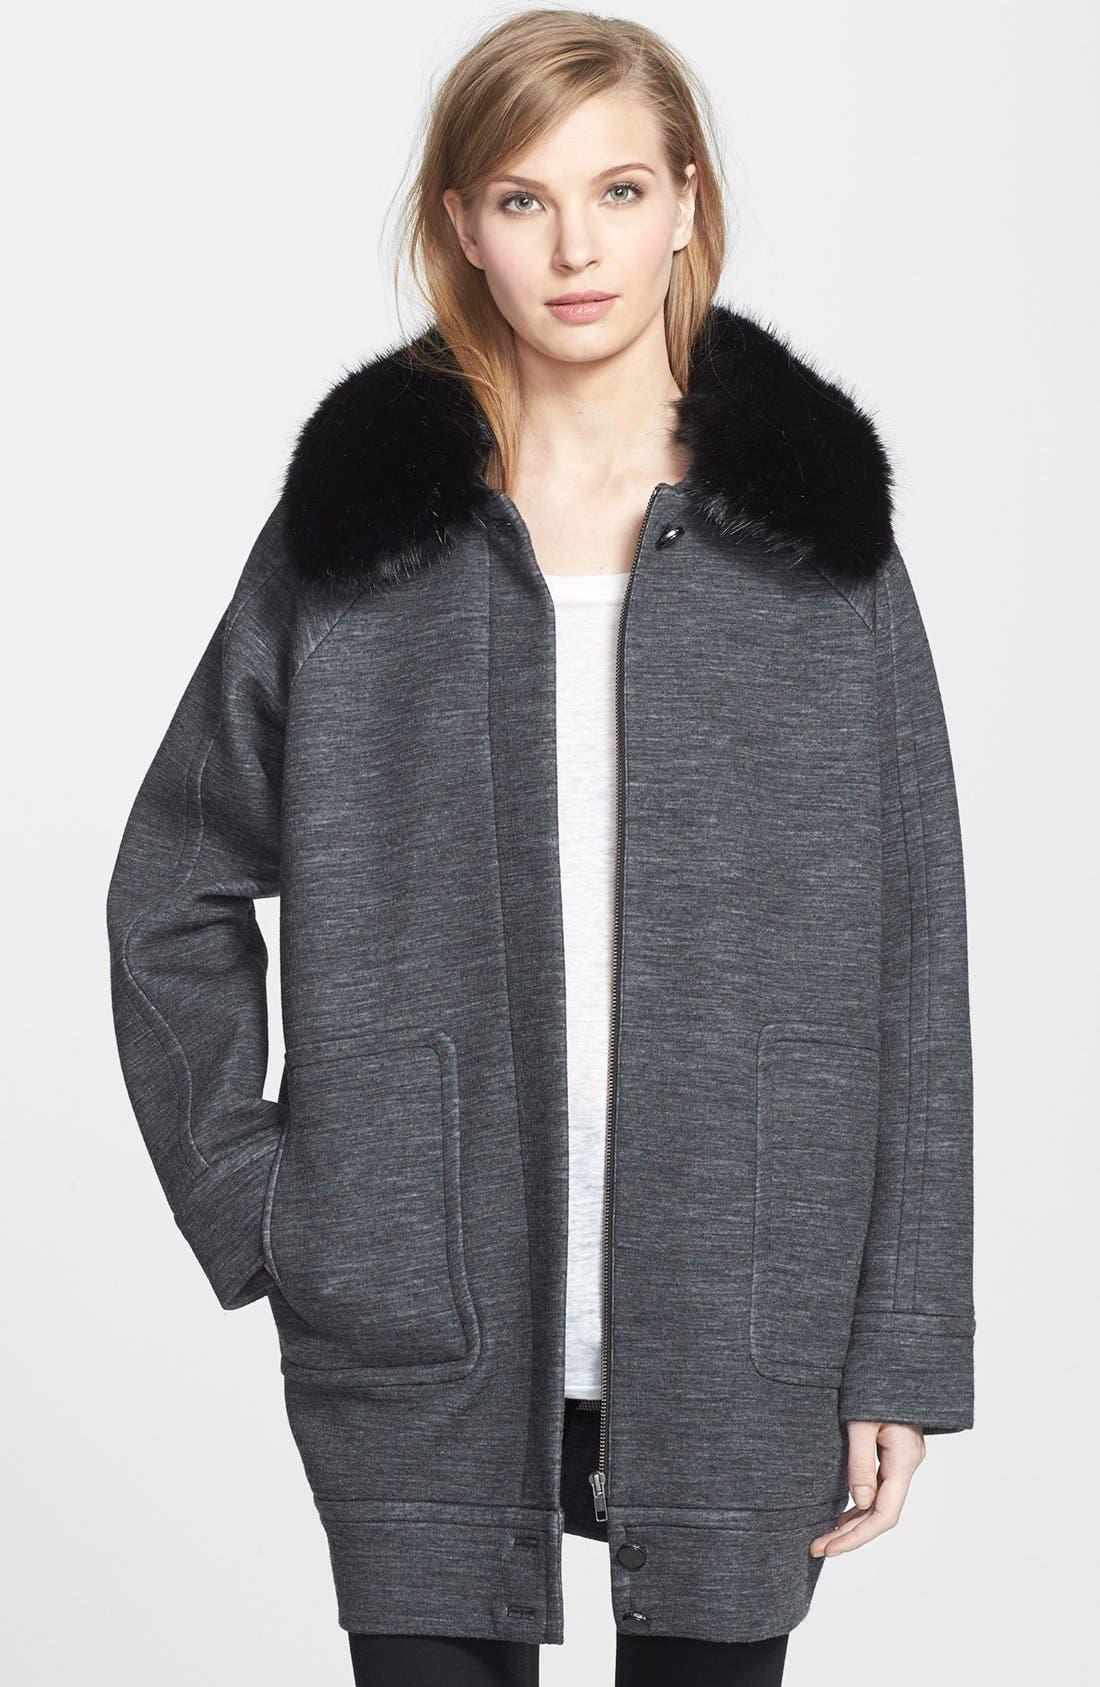 Main Image - MARC BY MARC JACOBS 'Gertrude' Faux Fur & Double Face Wool Blend Coat